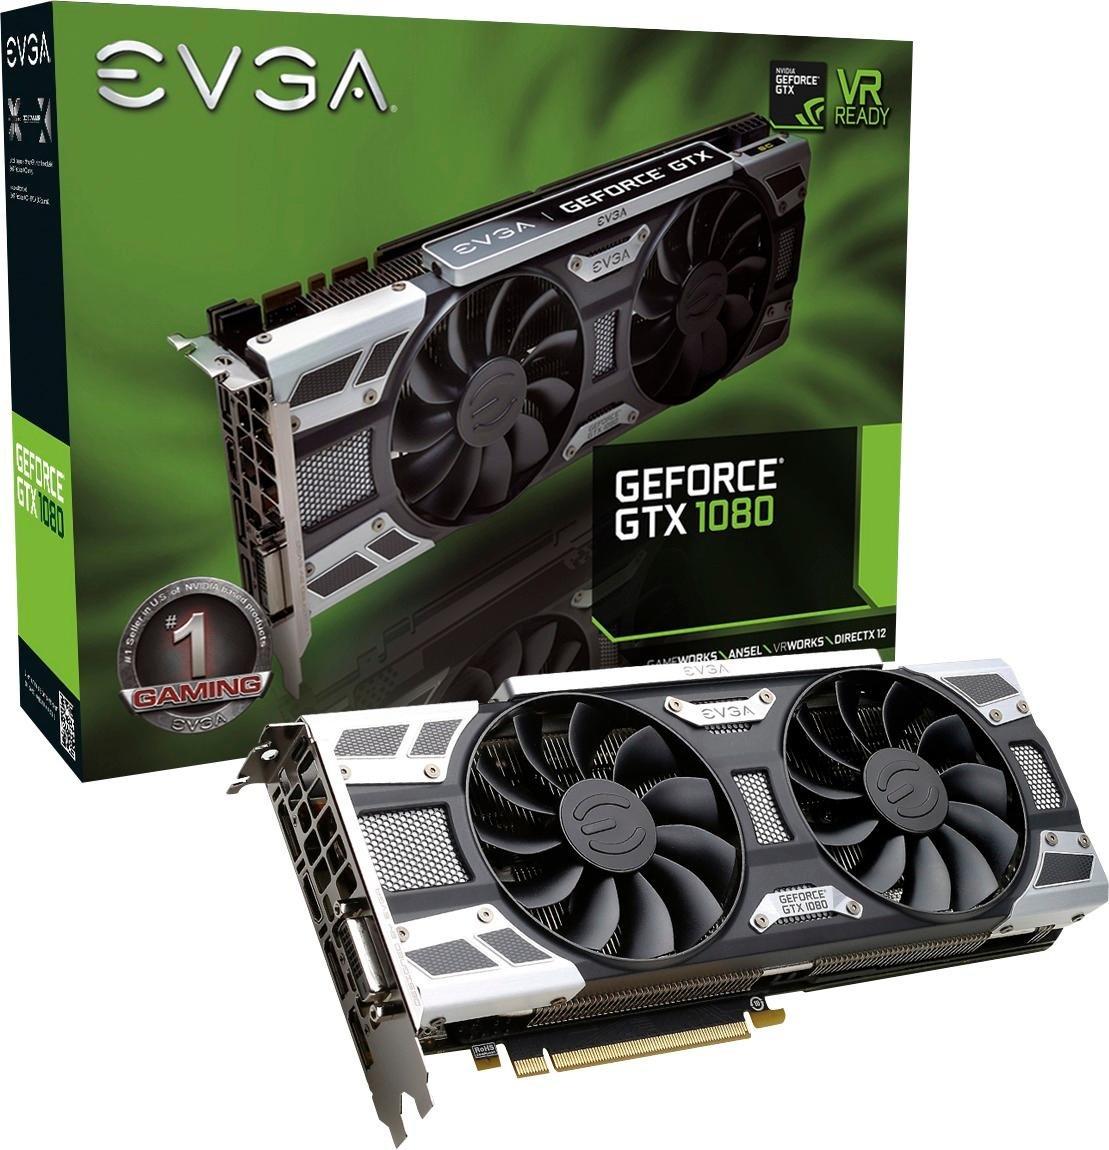 EVGA - NVIDIA GeForce GTX 1080 8 GB GDDR5 - PCI Express 3.0 ...